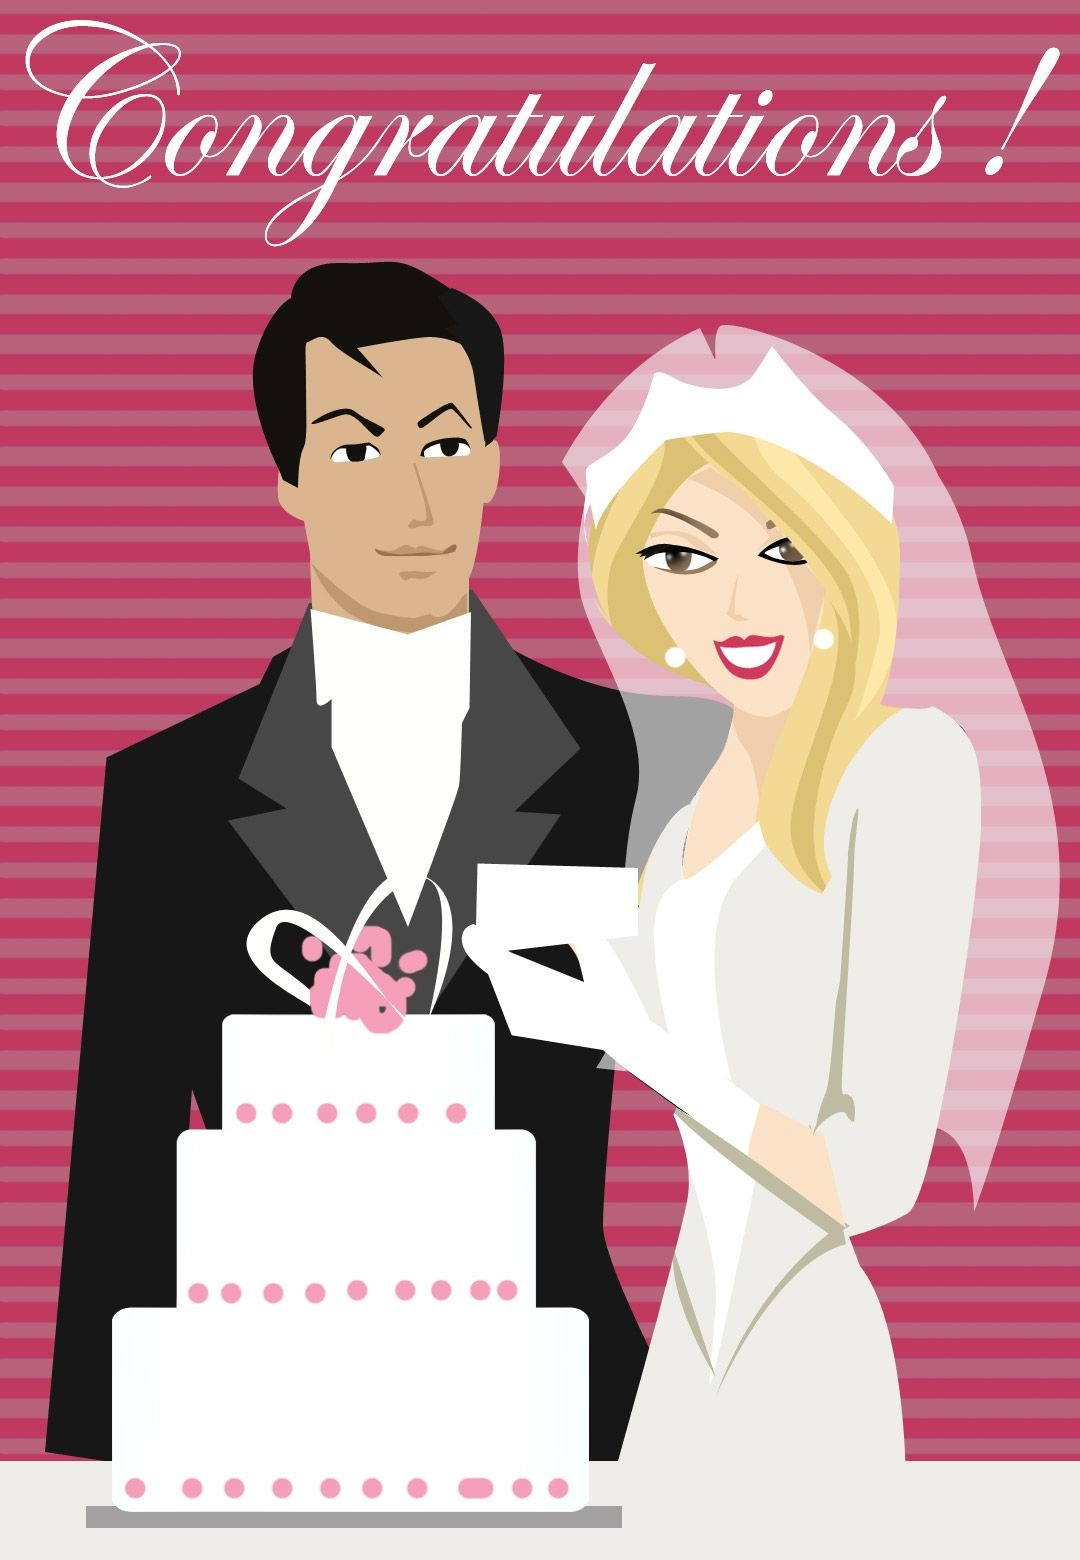 Free Printable Congratulations Greeting Card | Wedding Cards To - Wedding Wish Cards Printable Free